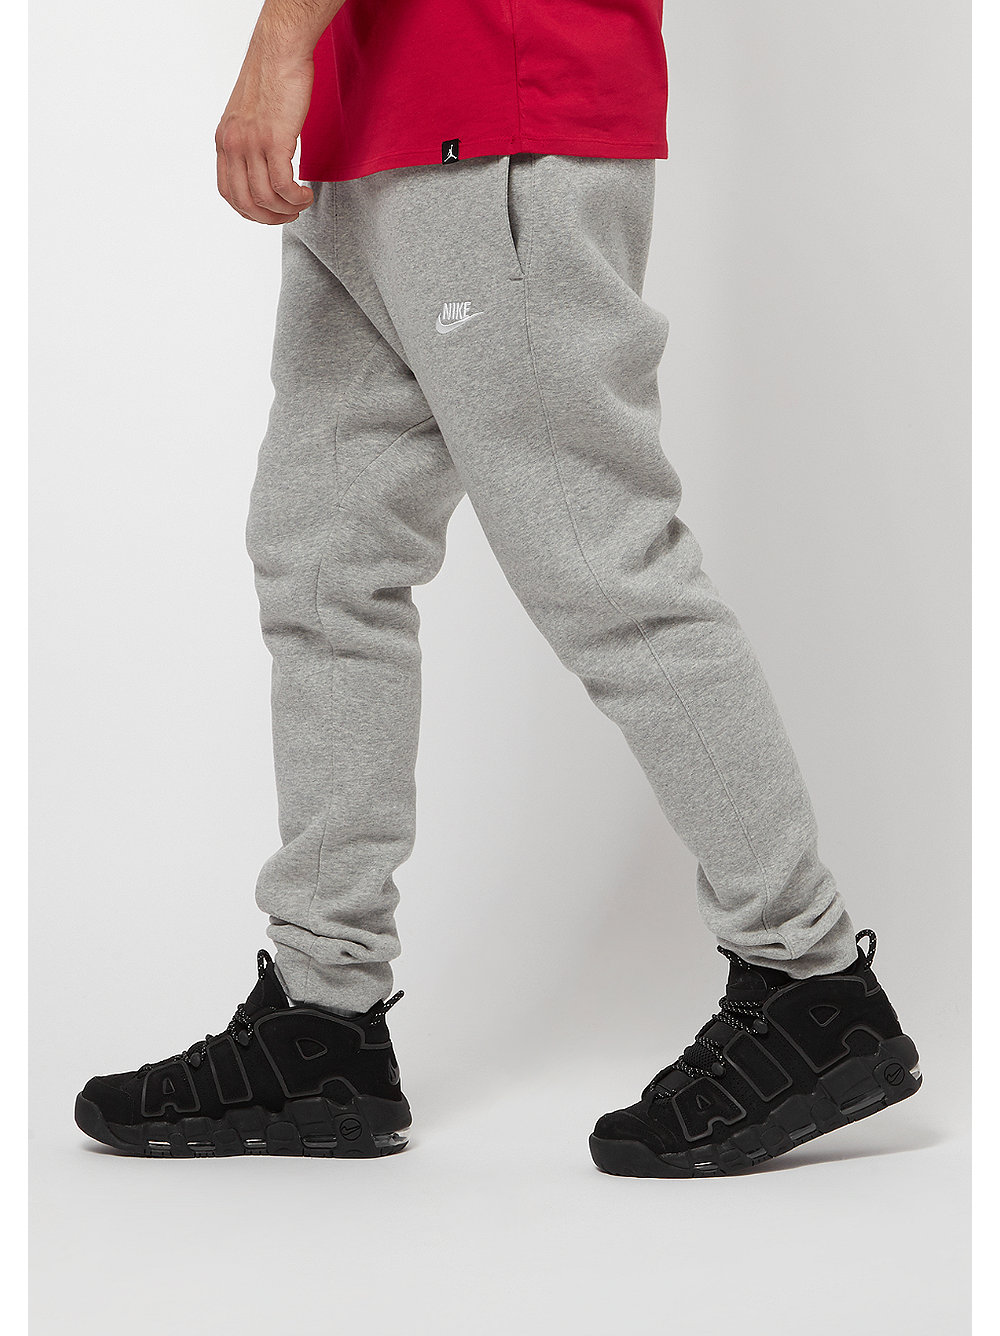 nike trainingshose sportswear jogger dark grey heather white bei snipes bestellen. Black Bedroom Furniture Sets. Home Design Ideas